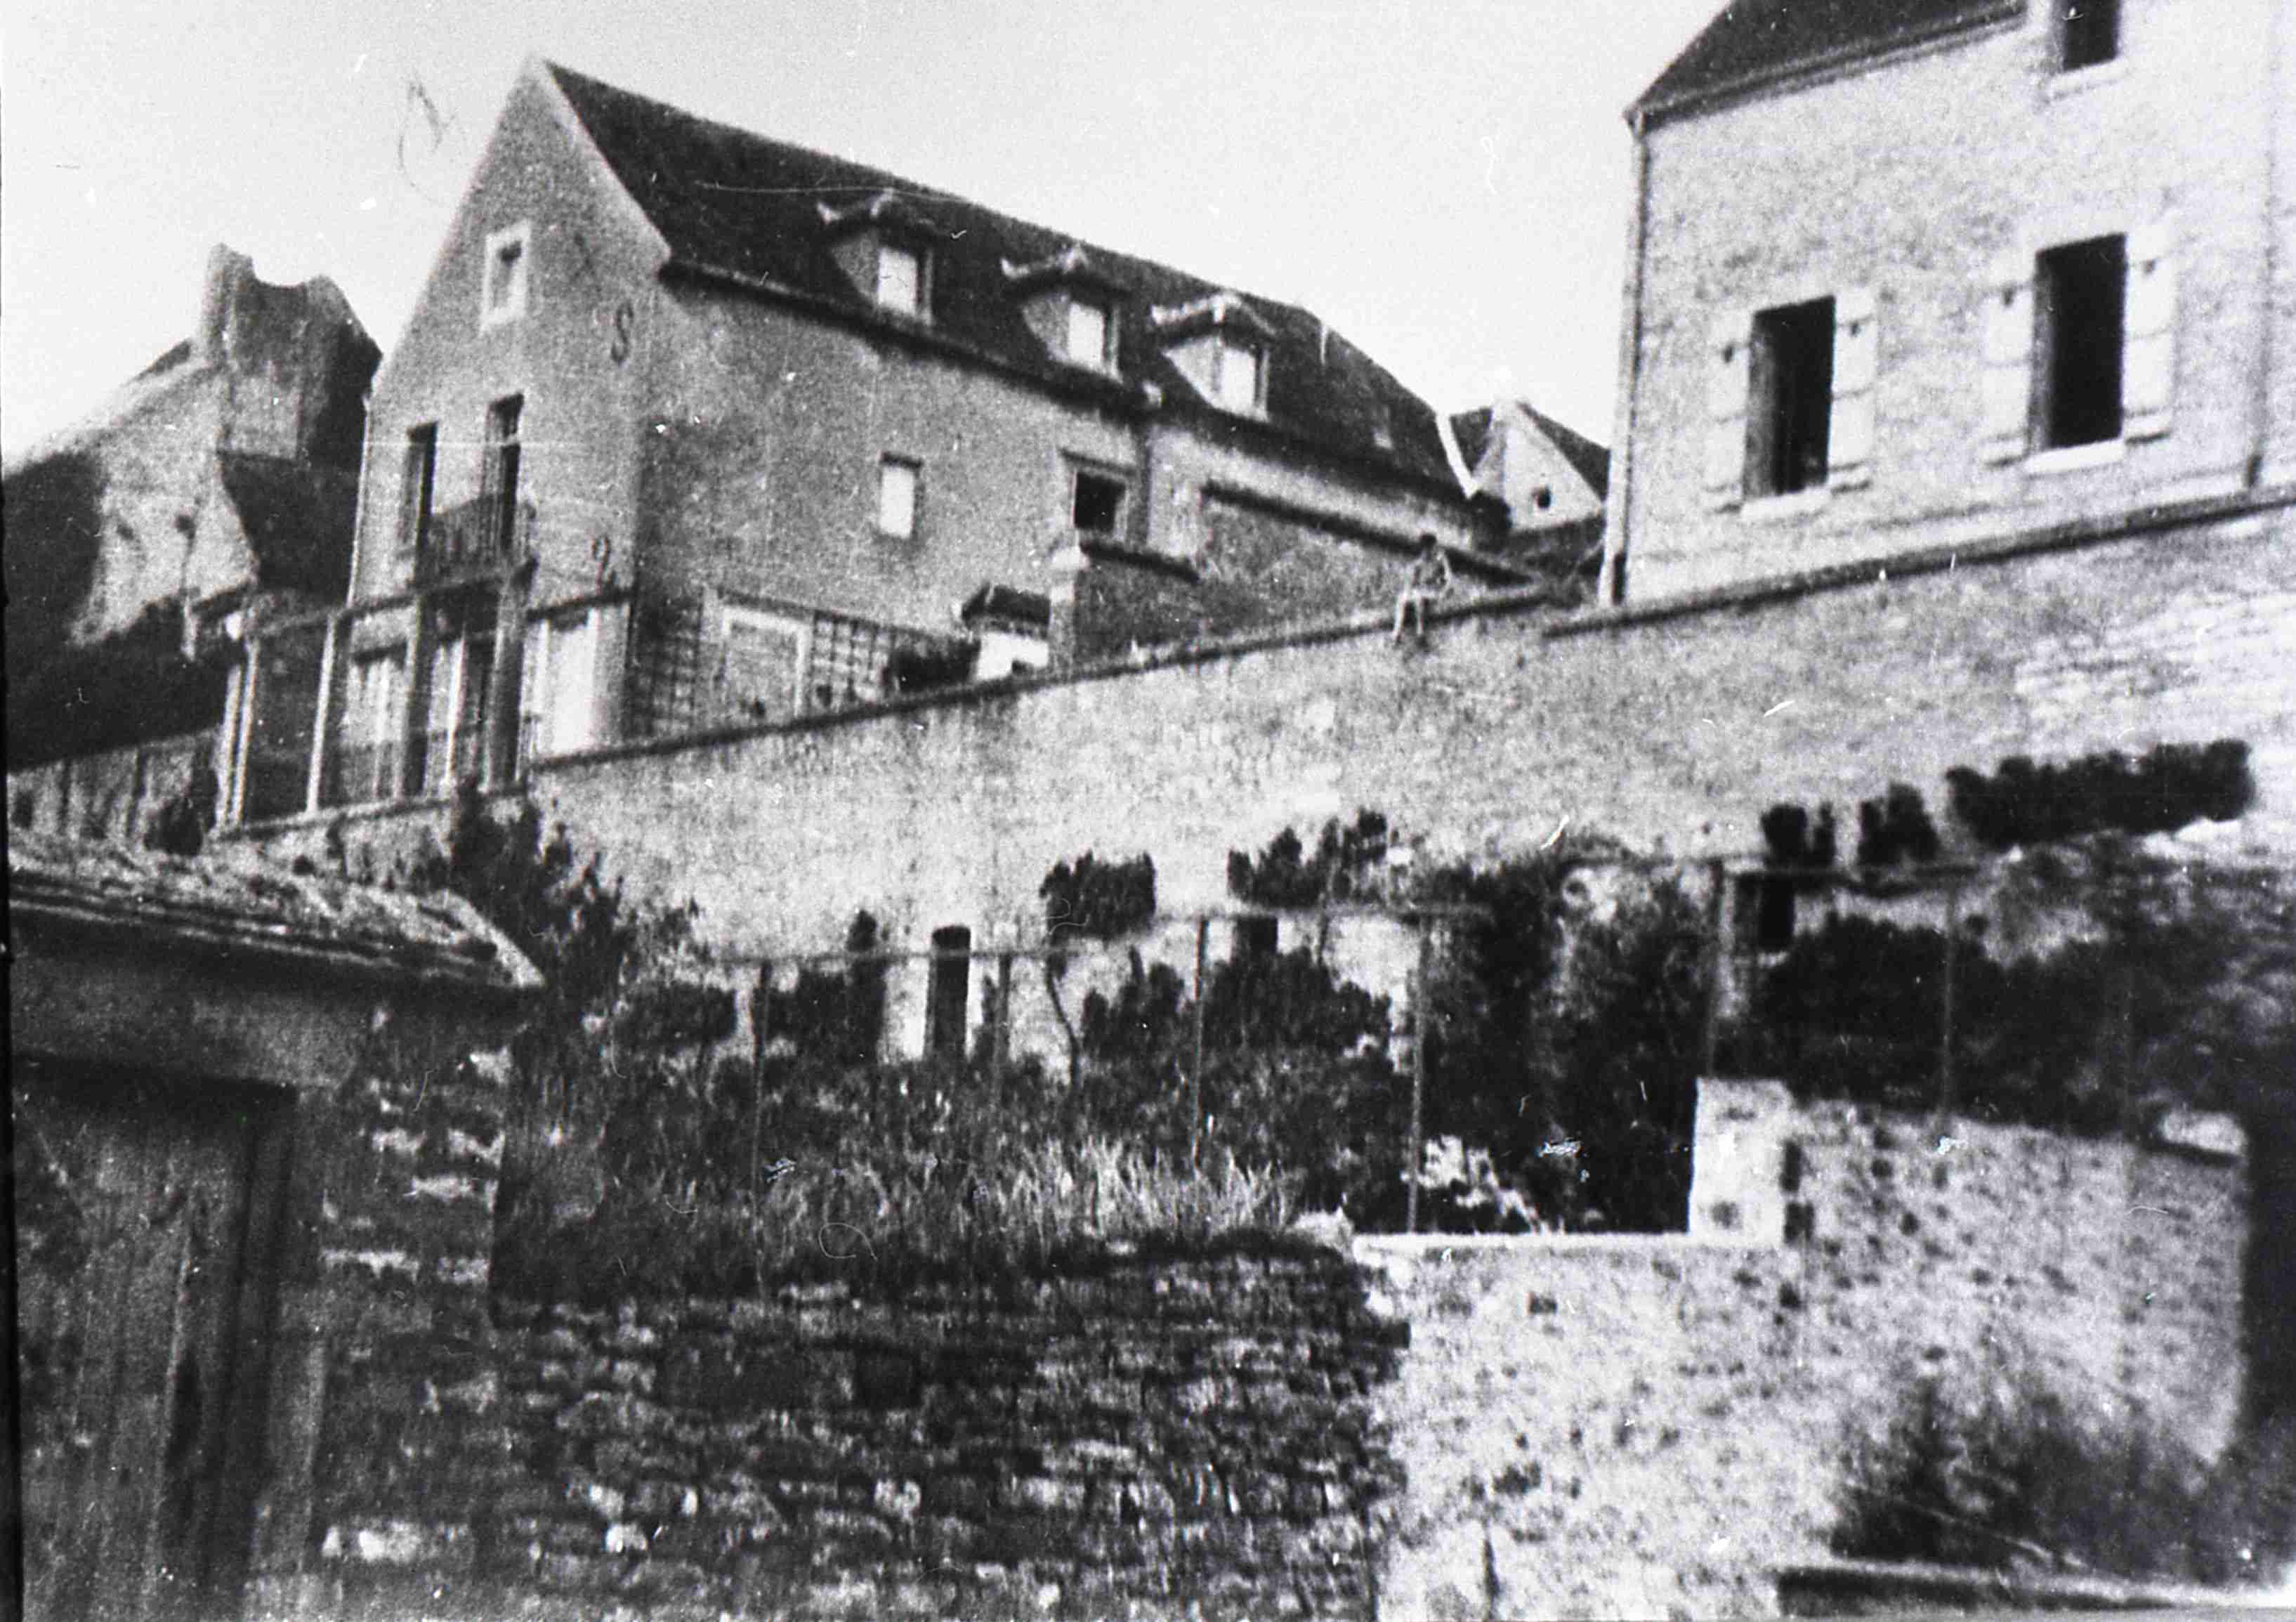 Экспонат #26. Дом Ромена Роллана в Везеле (Франция).